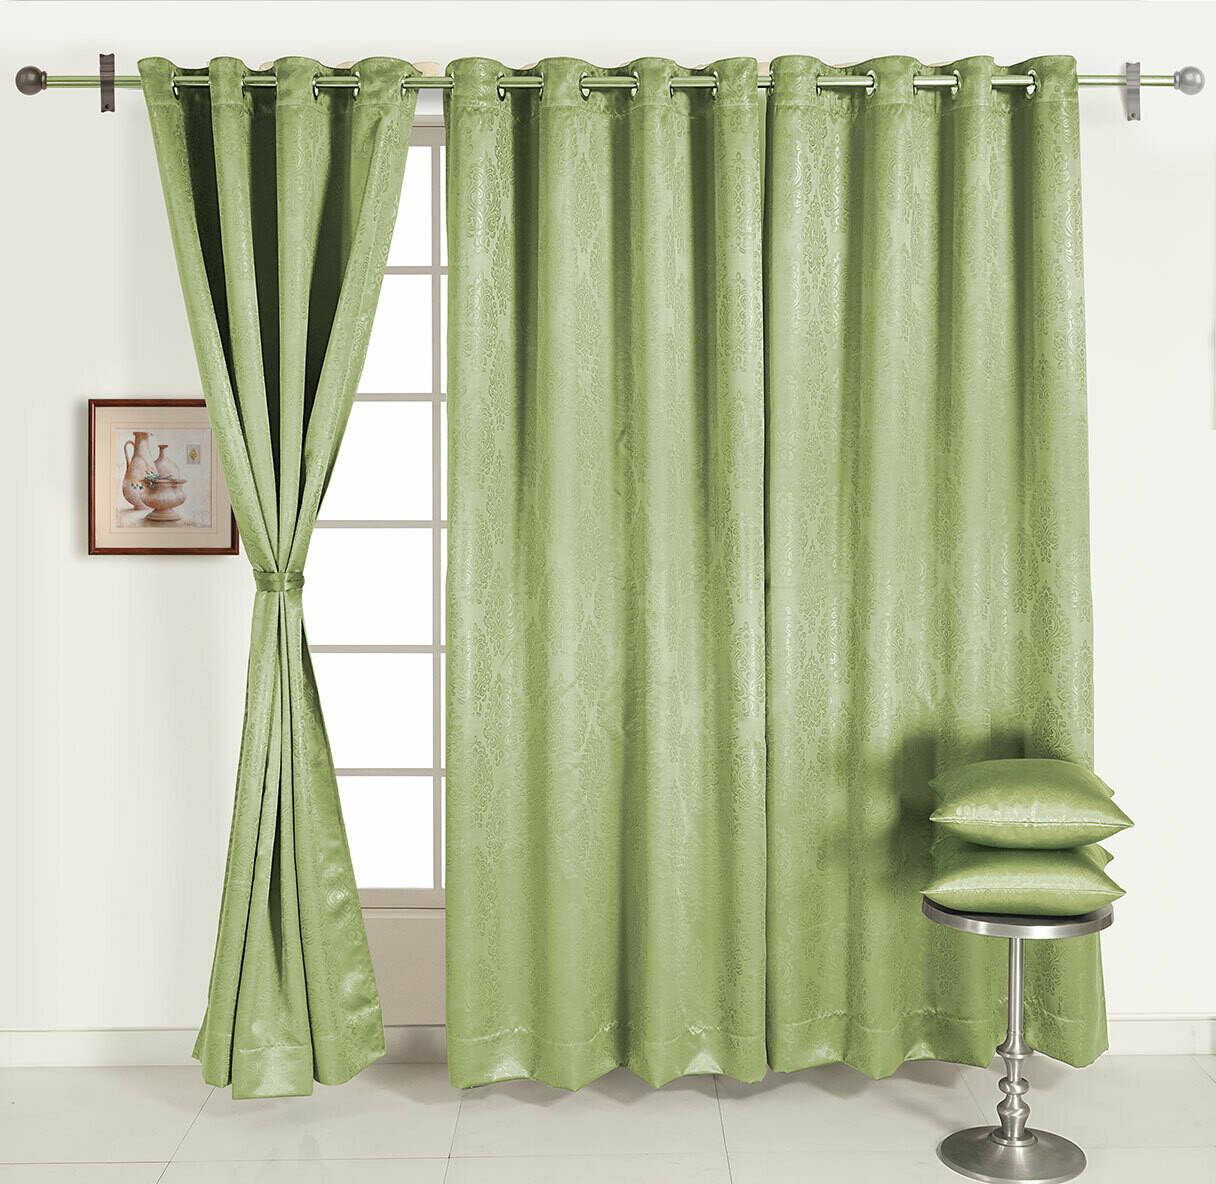 Swayam Green Colour Motif J&B Blackout Eyelet Curtain for Door